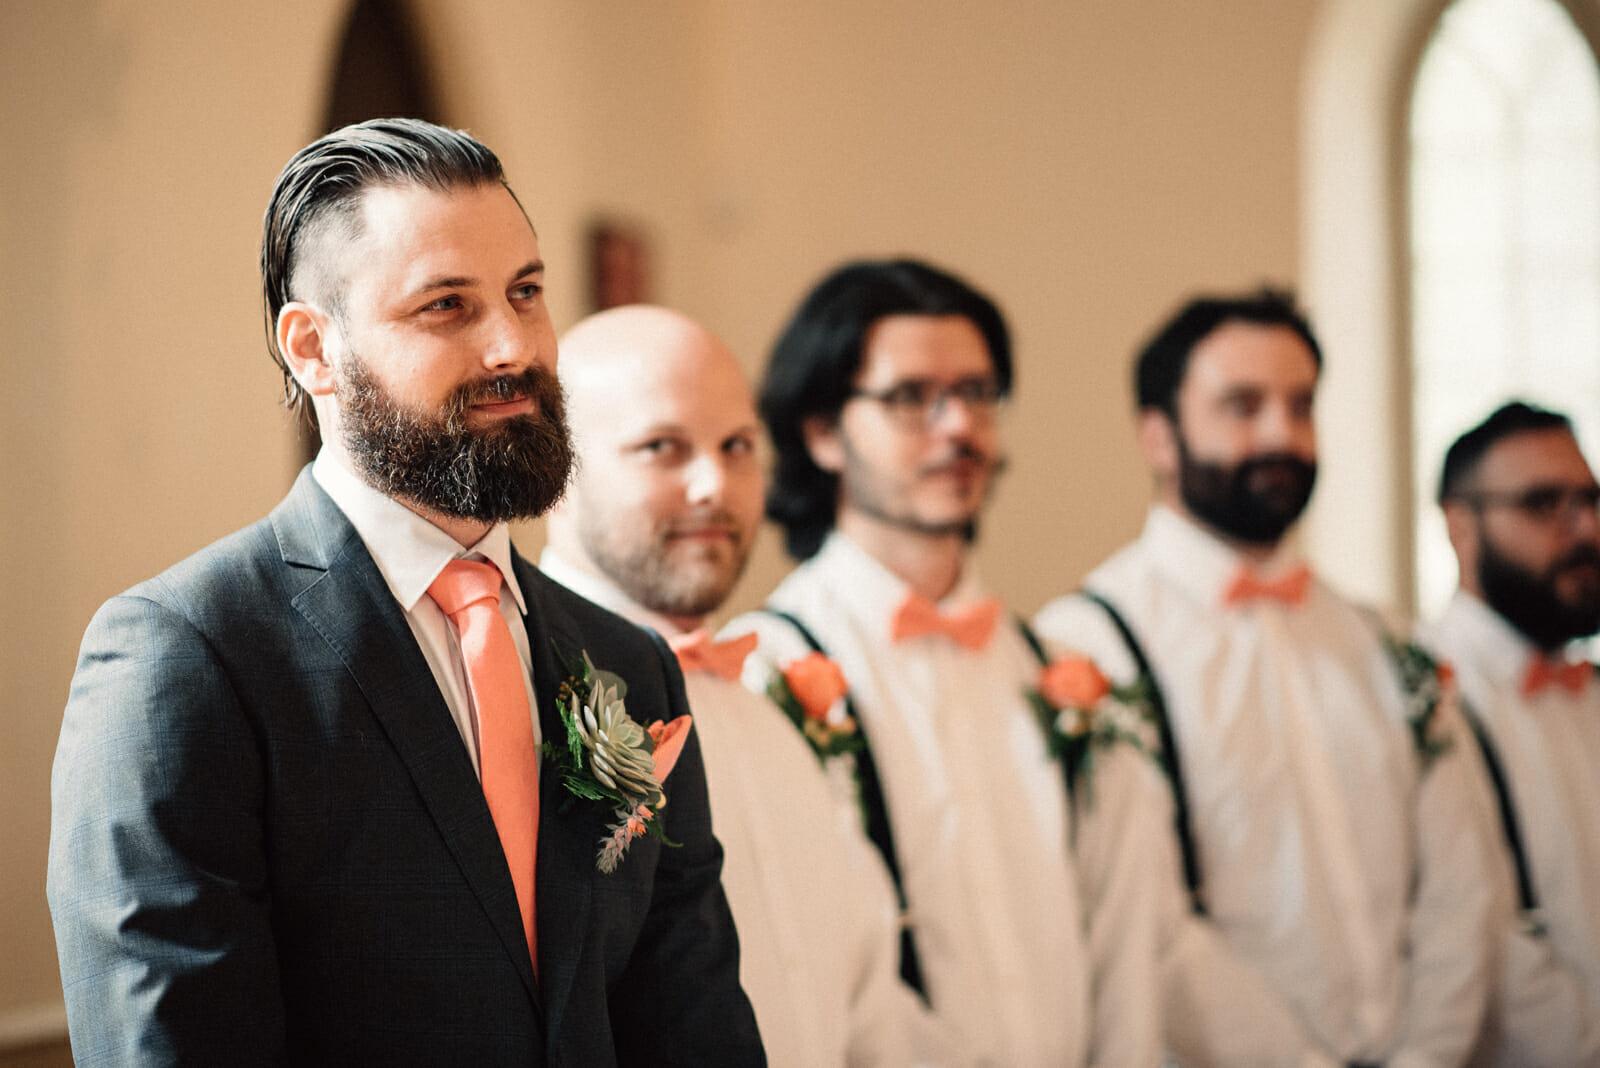 groom looks on as his bride walks down the aisle